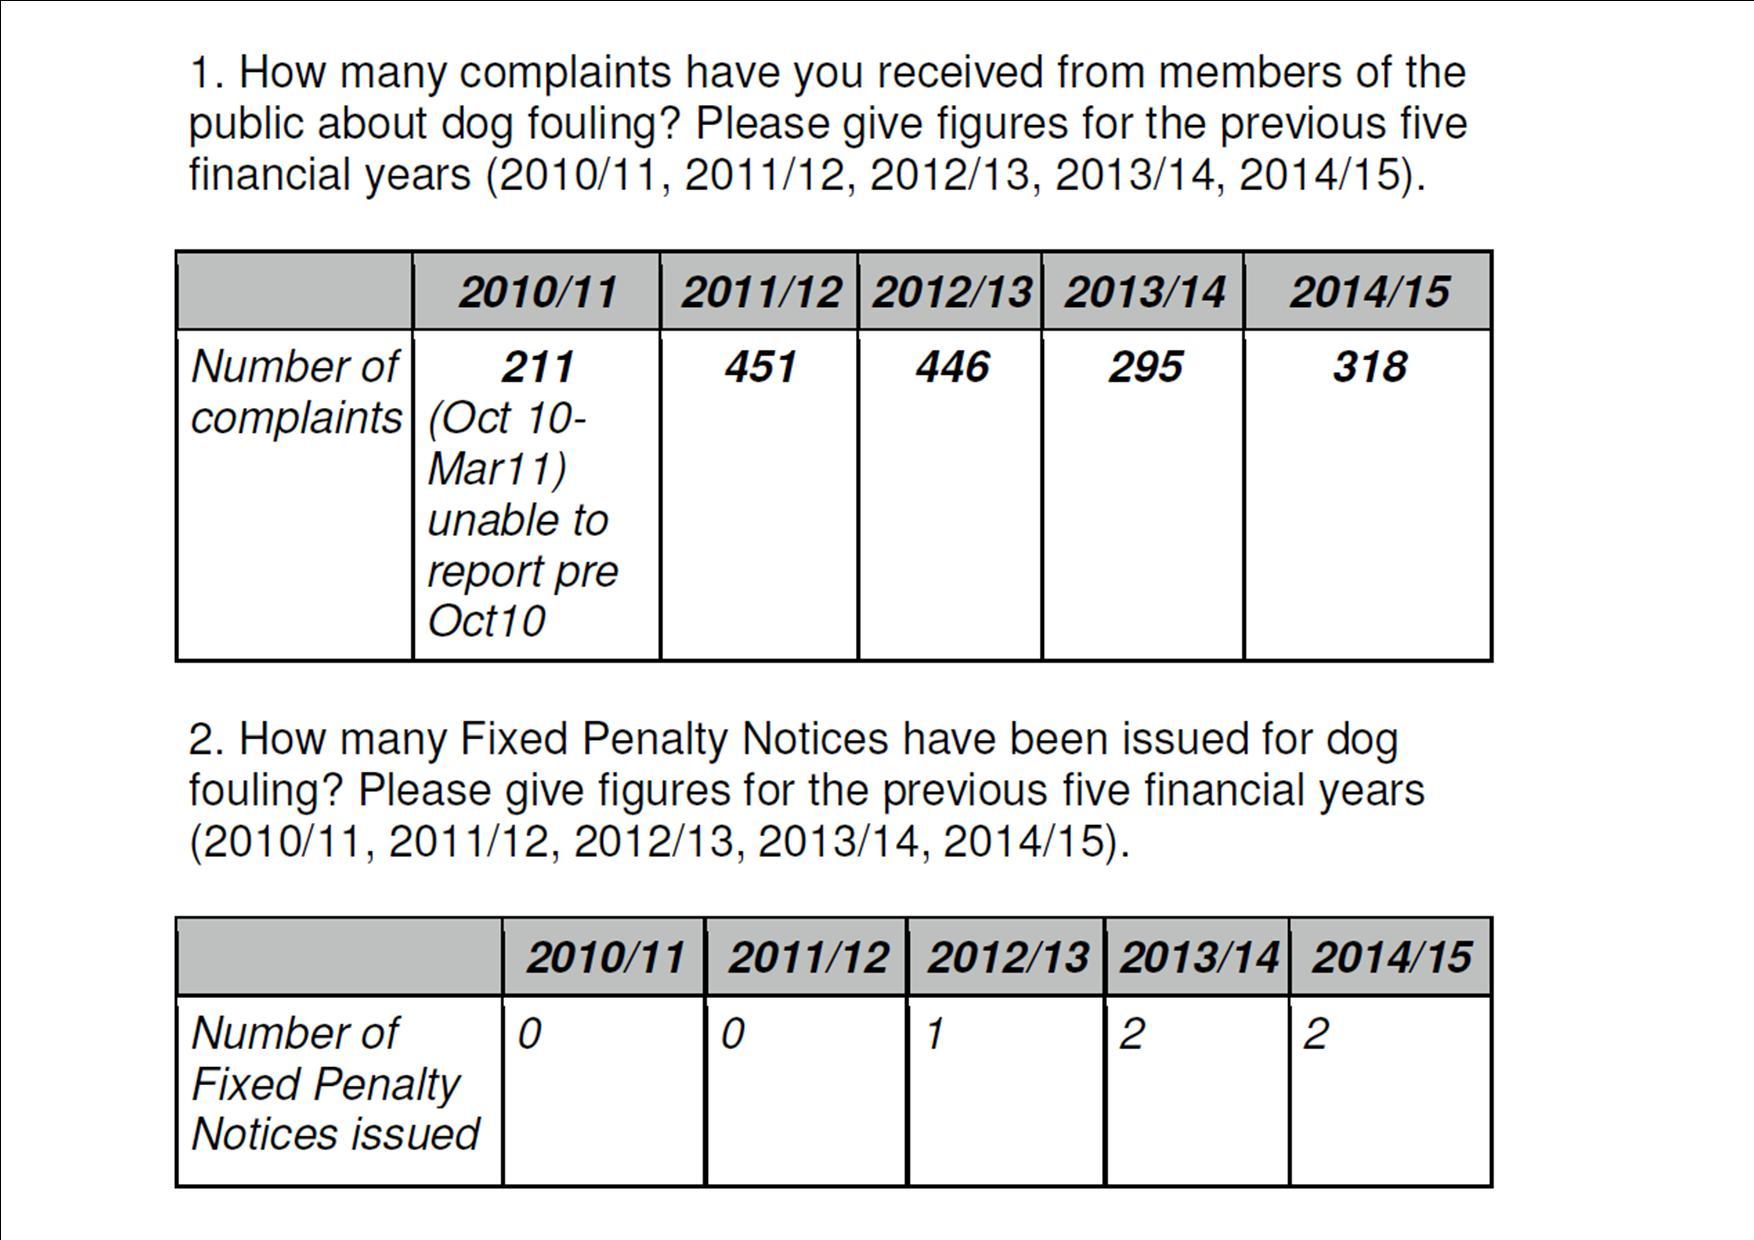 Dog fouling complaints